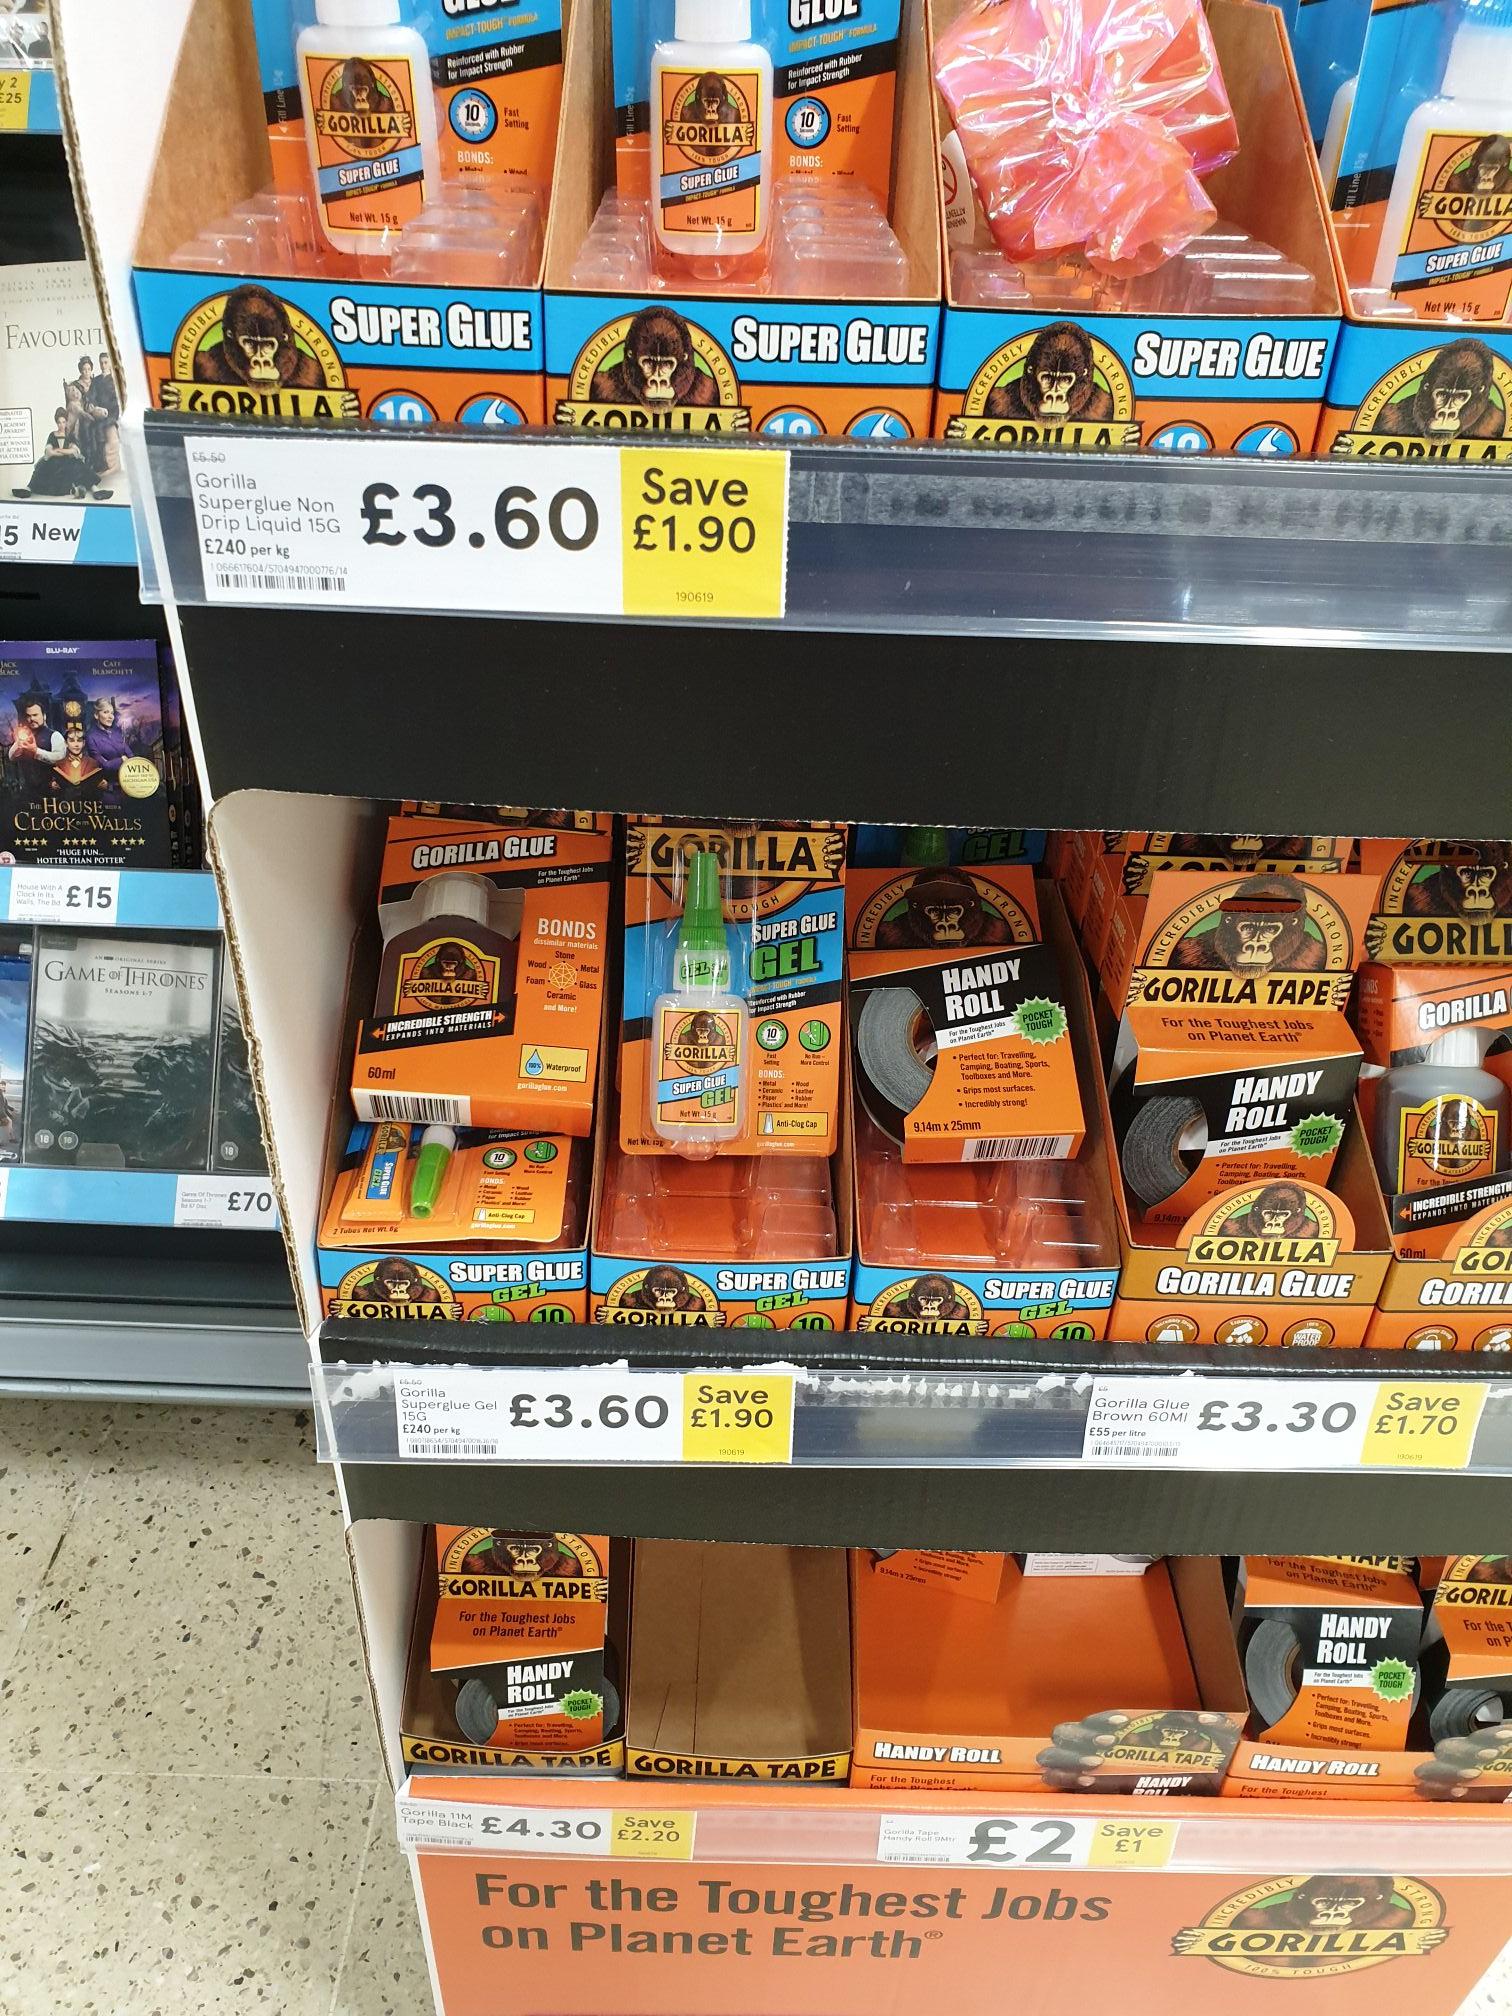 Gorilla Super Glue Gel  £3.60 @ Tesco  instore & online